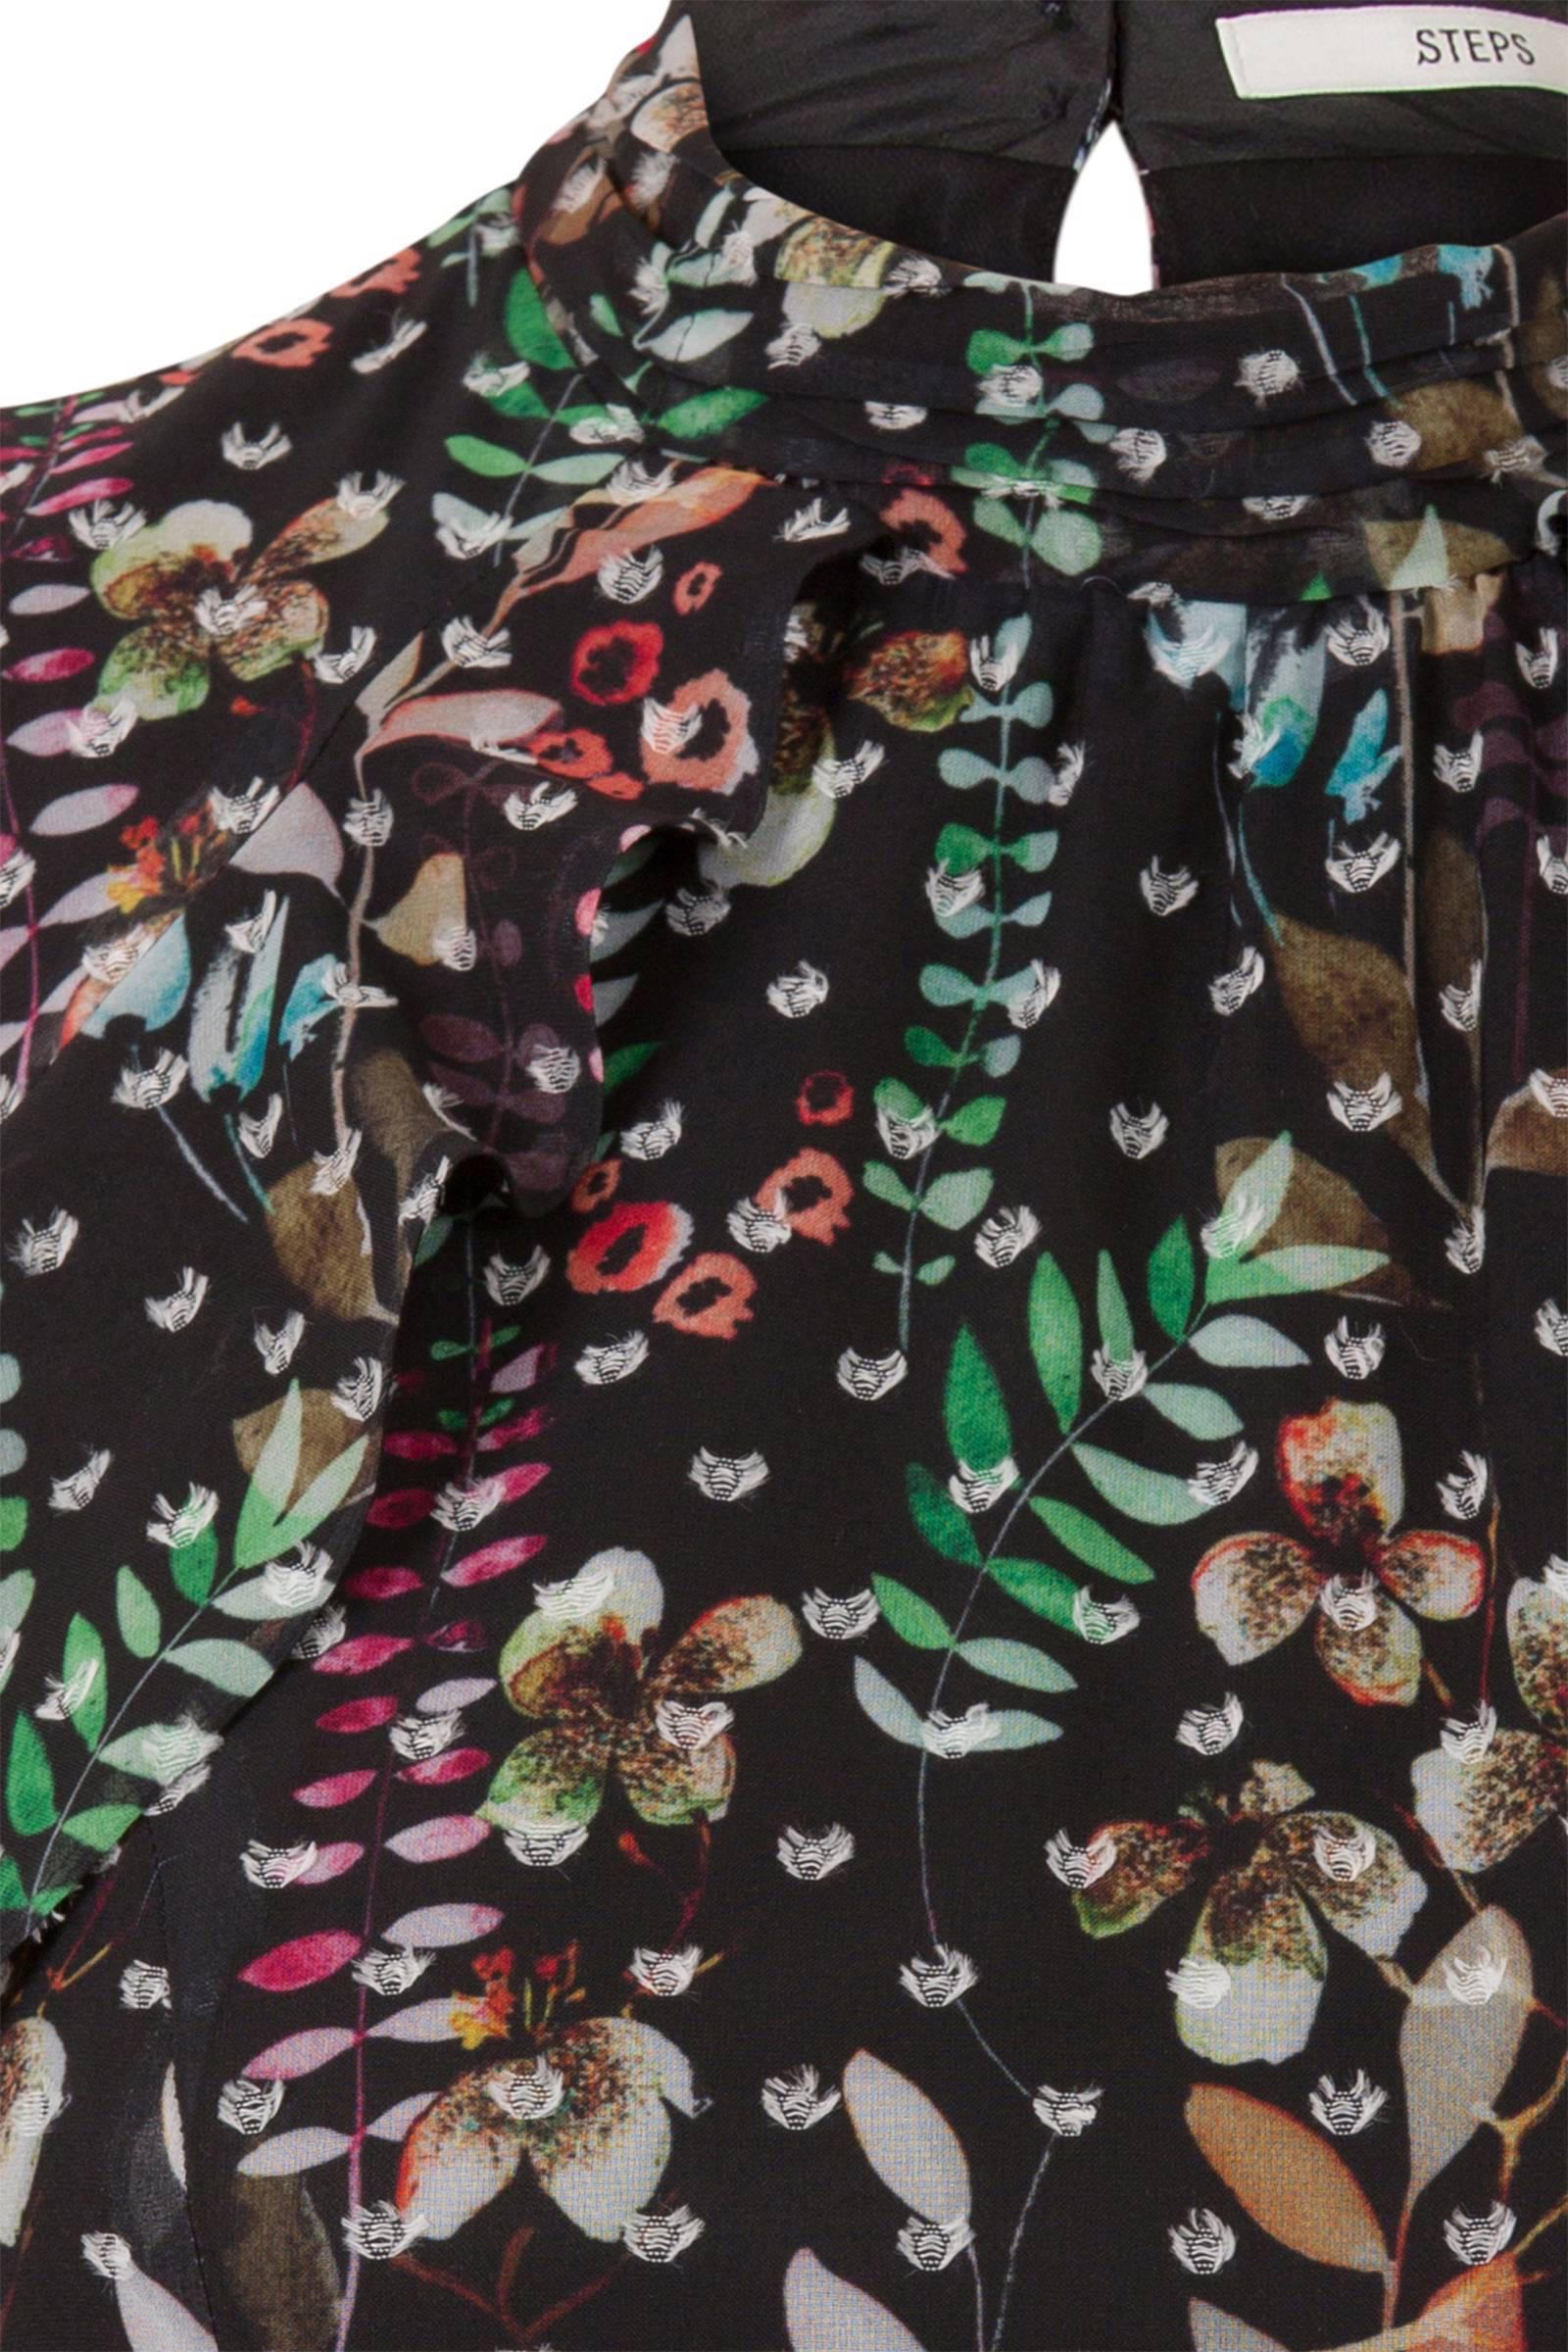 b6bc9284b16efc bloemen jurk en met ruffles wehkamp zwart Steps wEzvqdv